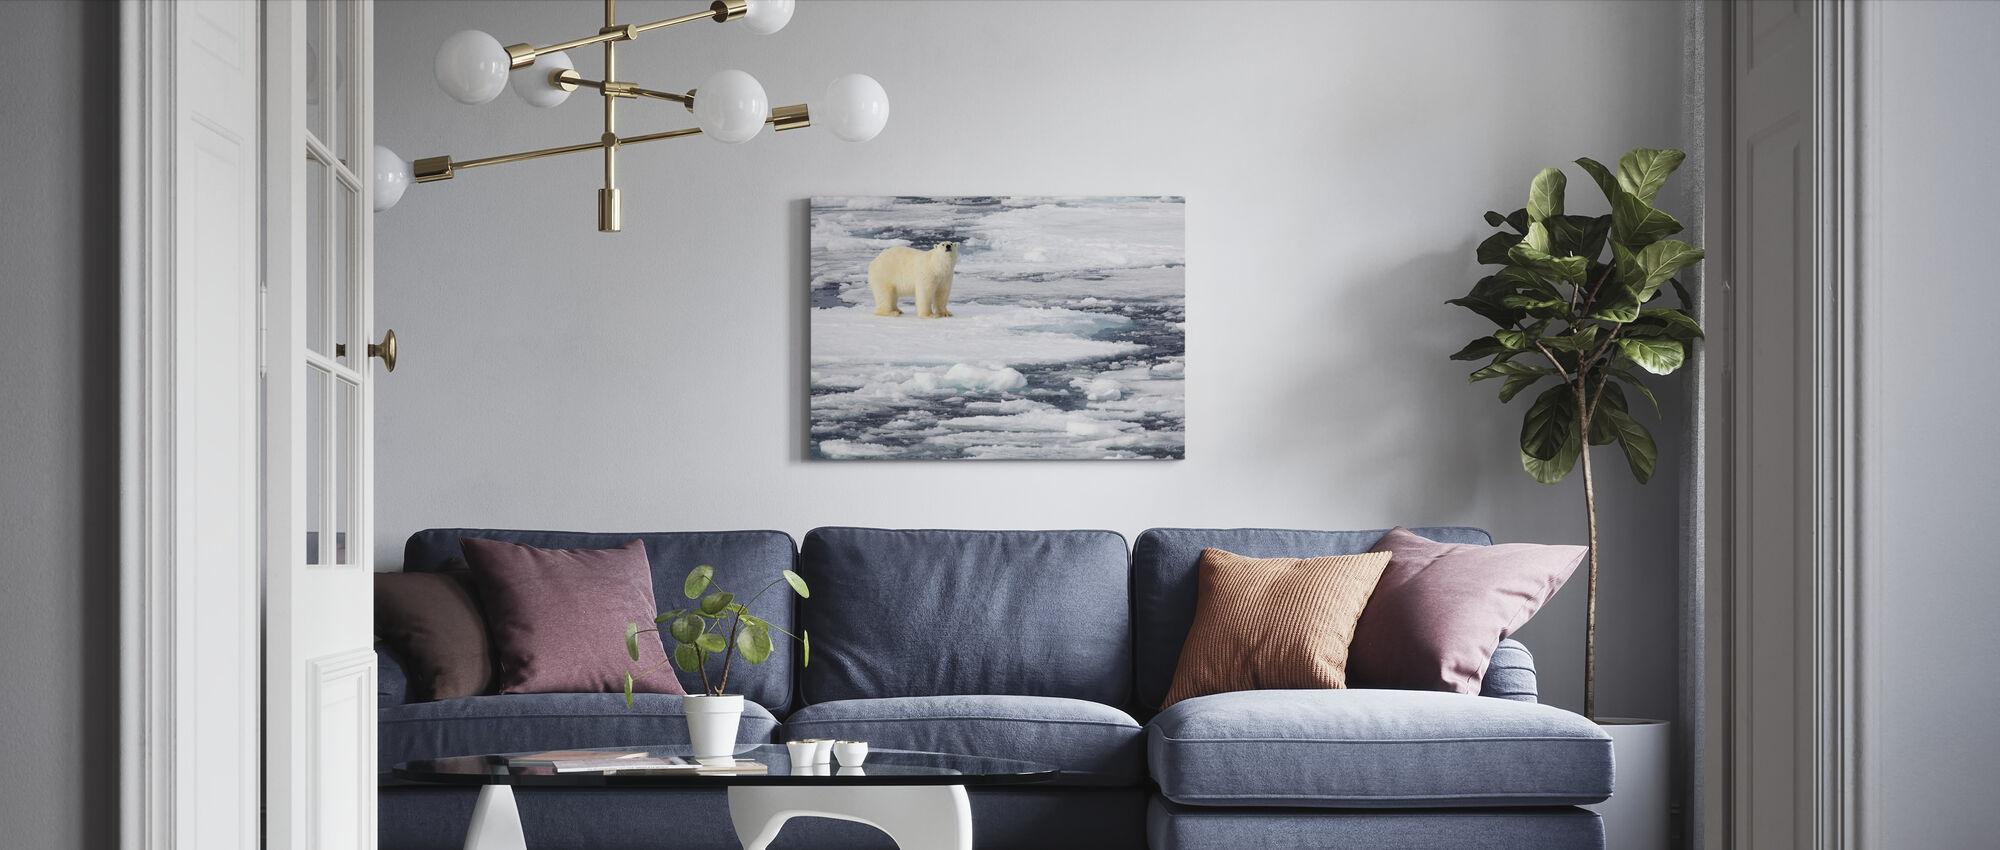 Isbjörn på havet is - Canvastavla - Vardagsrum